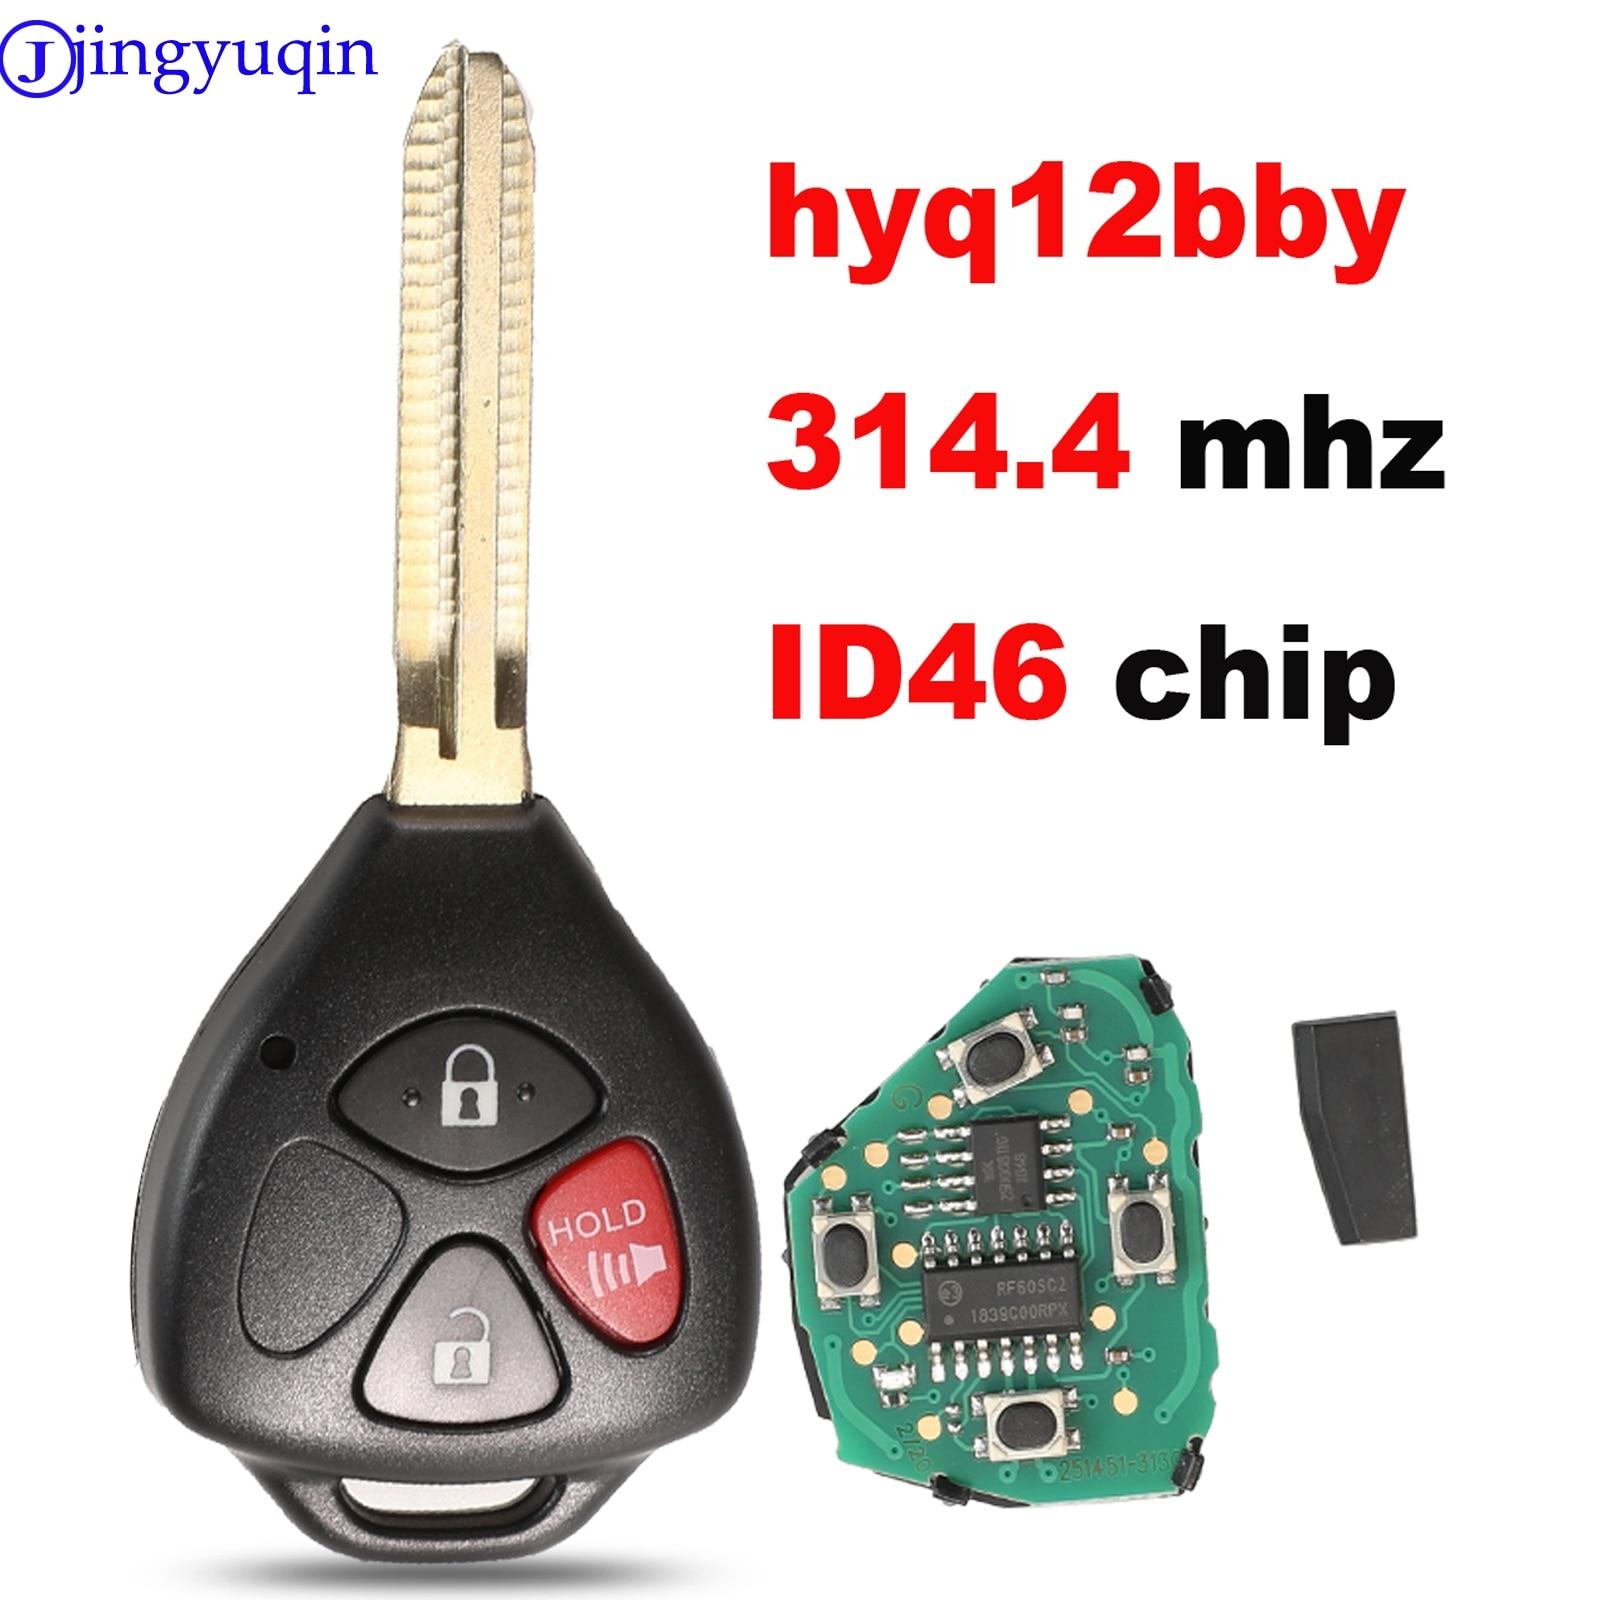 Jingyuqin 3 botones a 314mhz HyQ12BBY con Chip ID67 llave de control remoto para Toyota RAV4 Yaris Venza Scion tC/xA/xB/xC